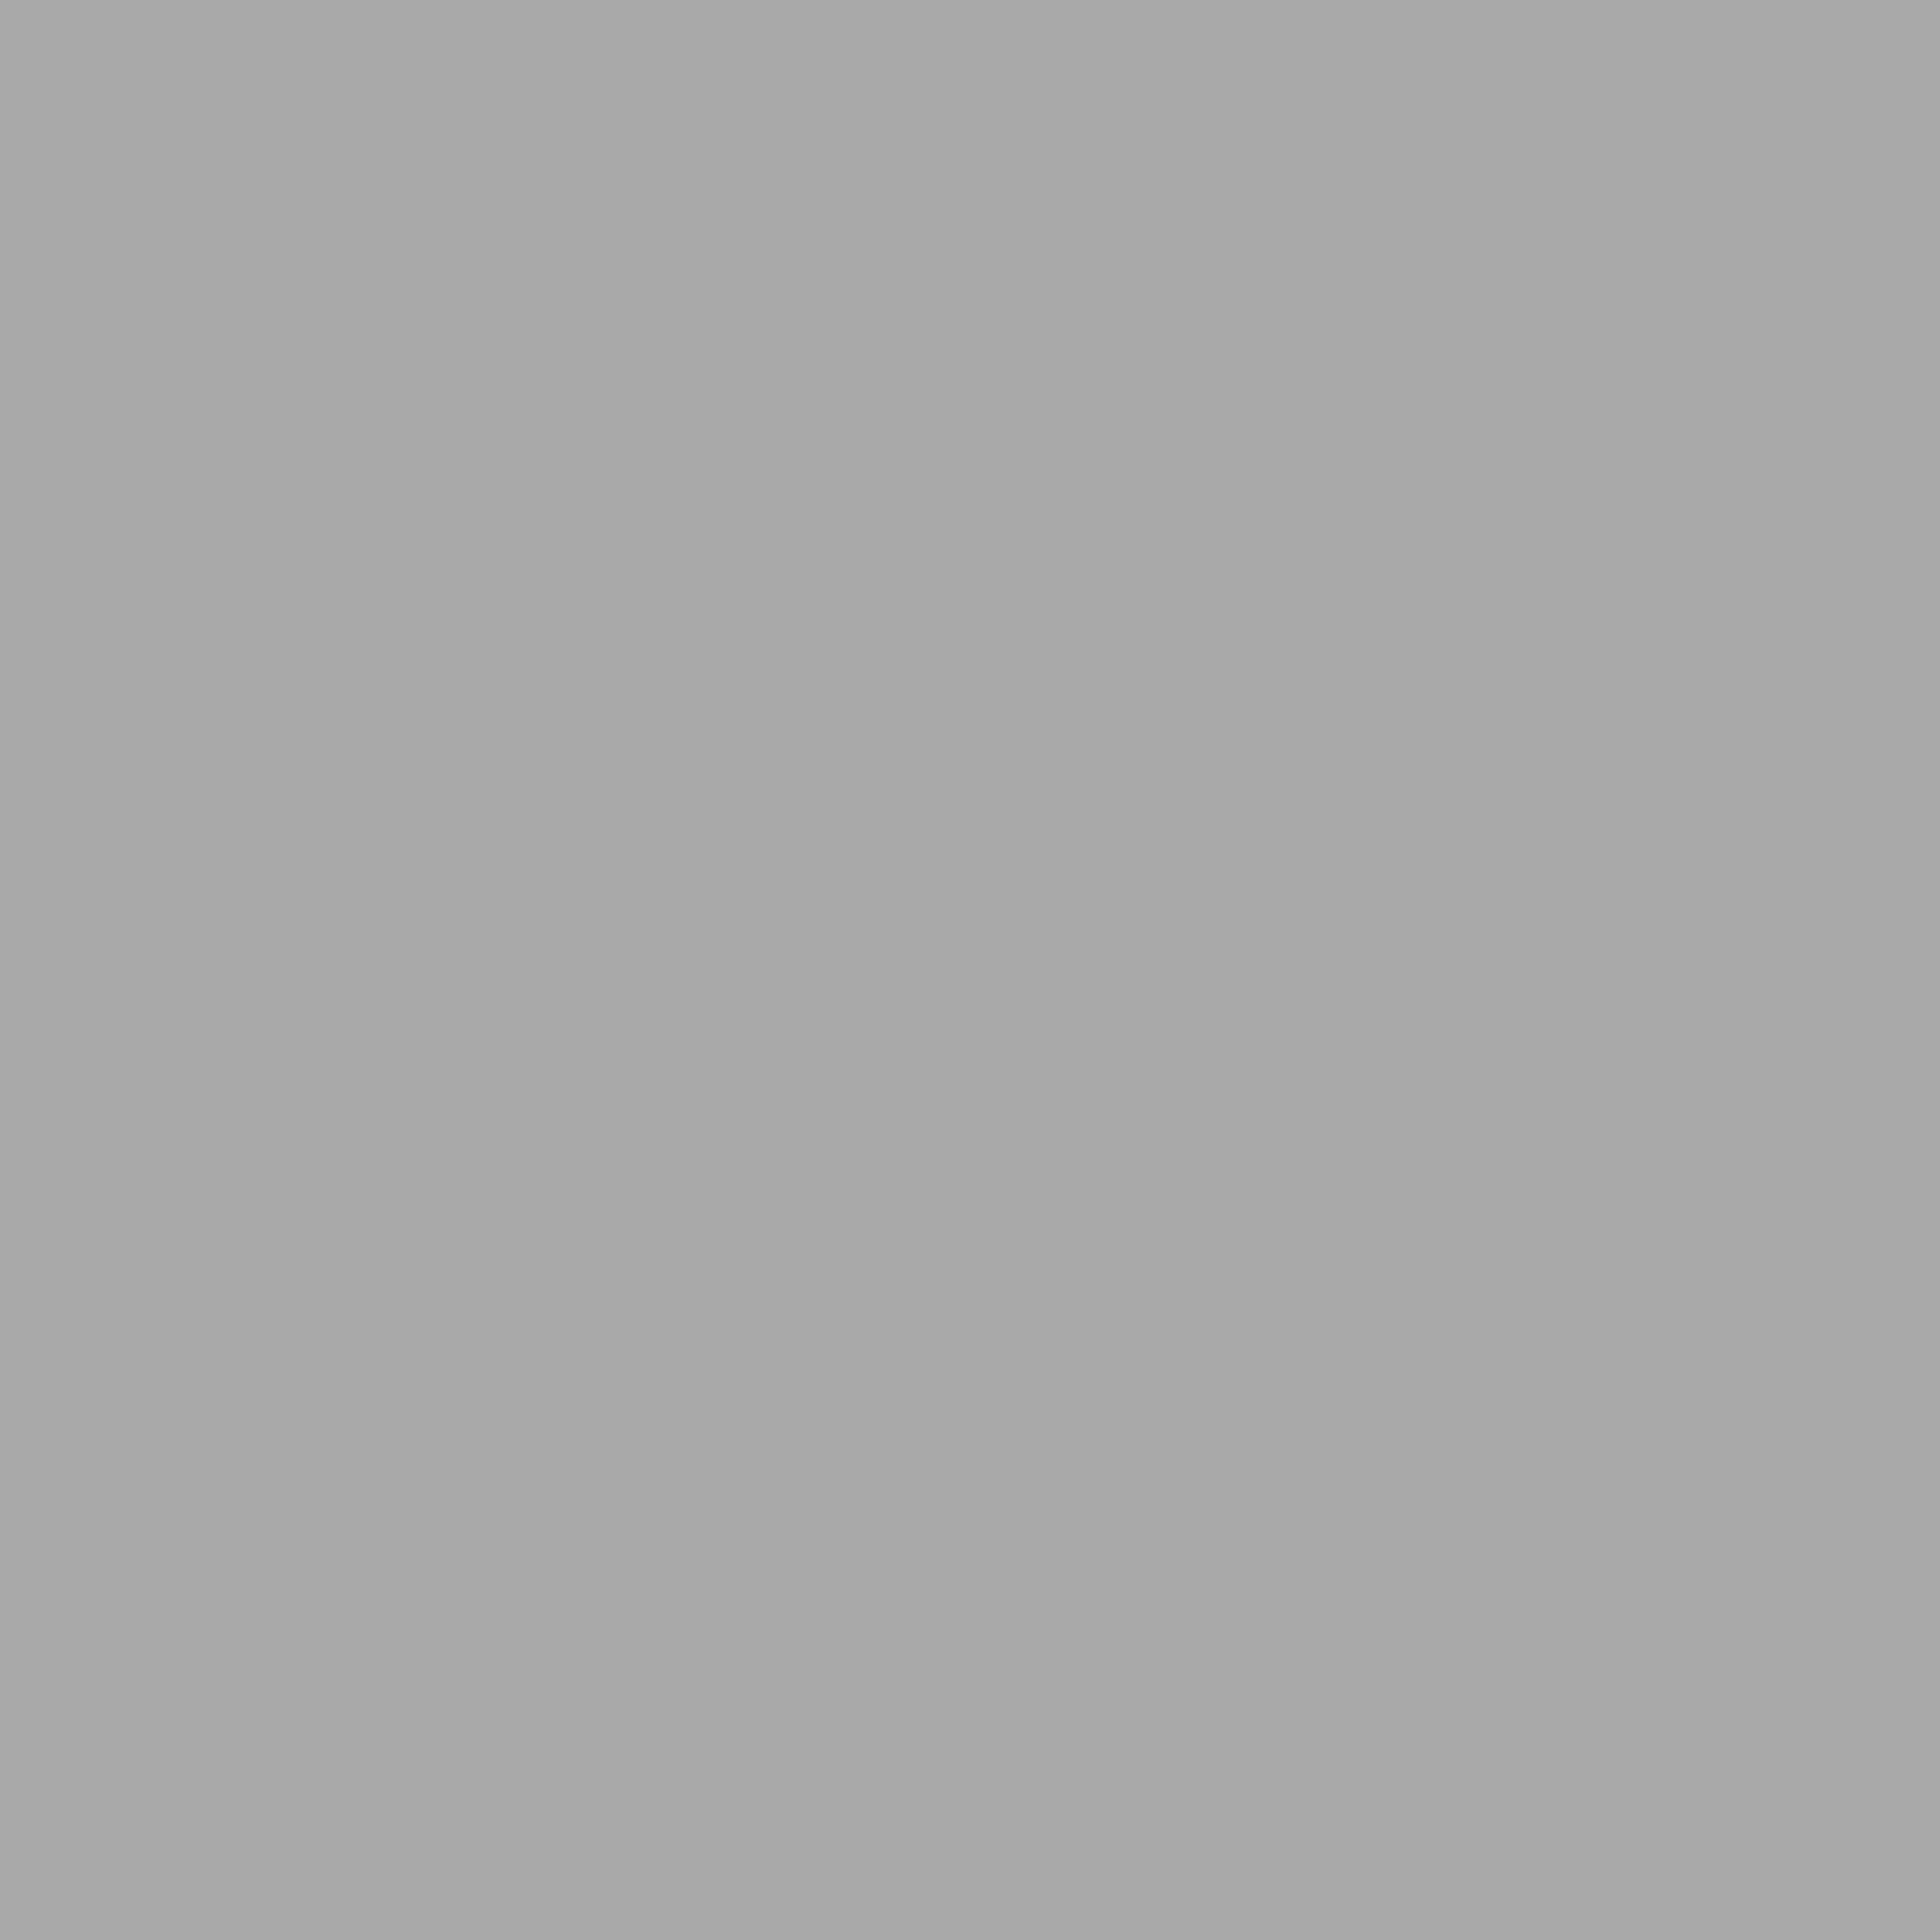 2048x2048 Dark Gray Solid Color Background